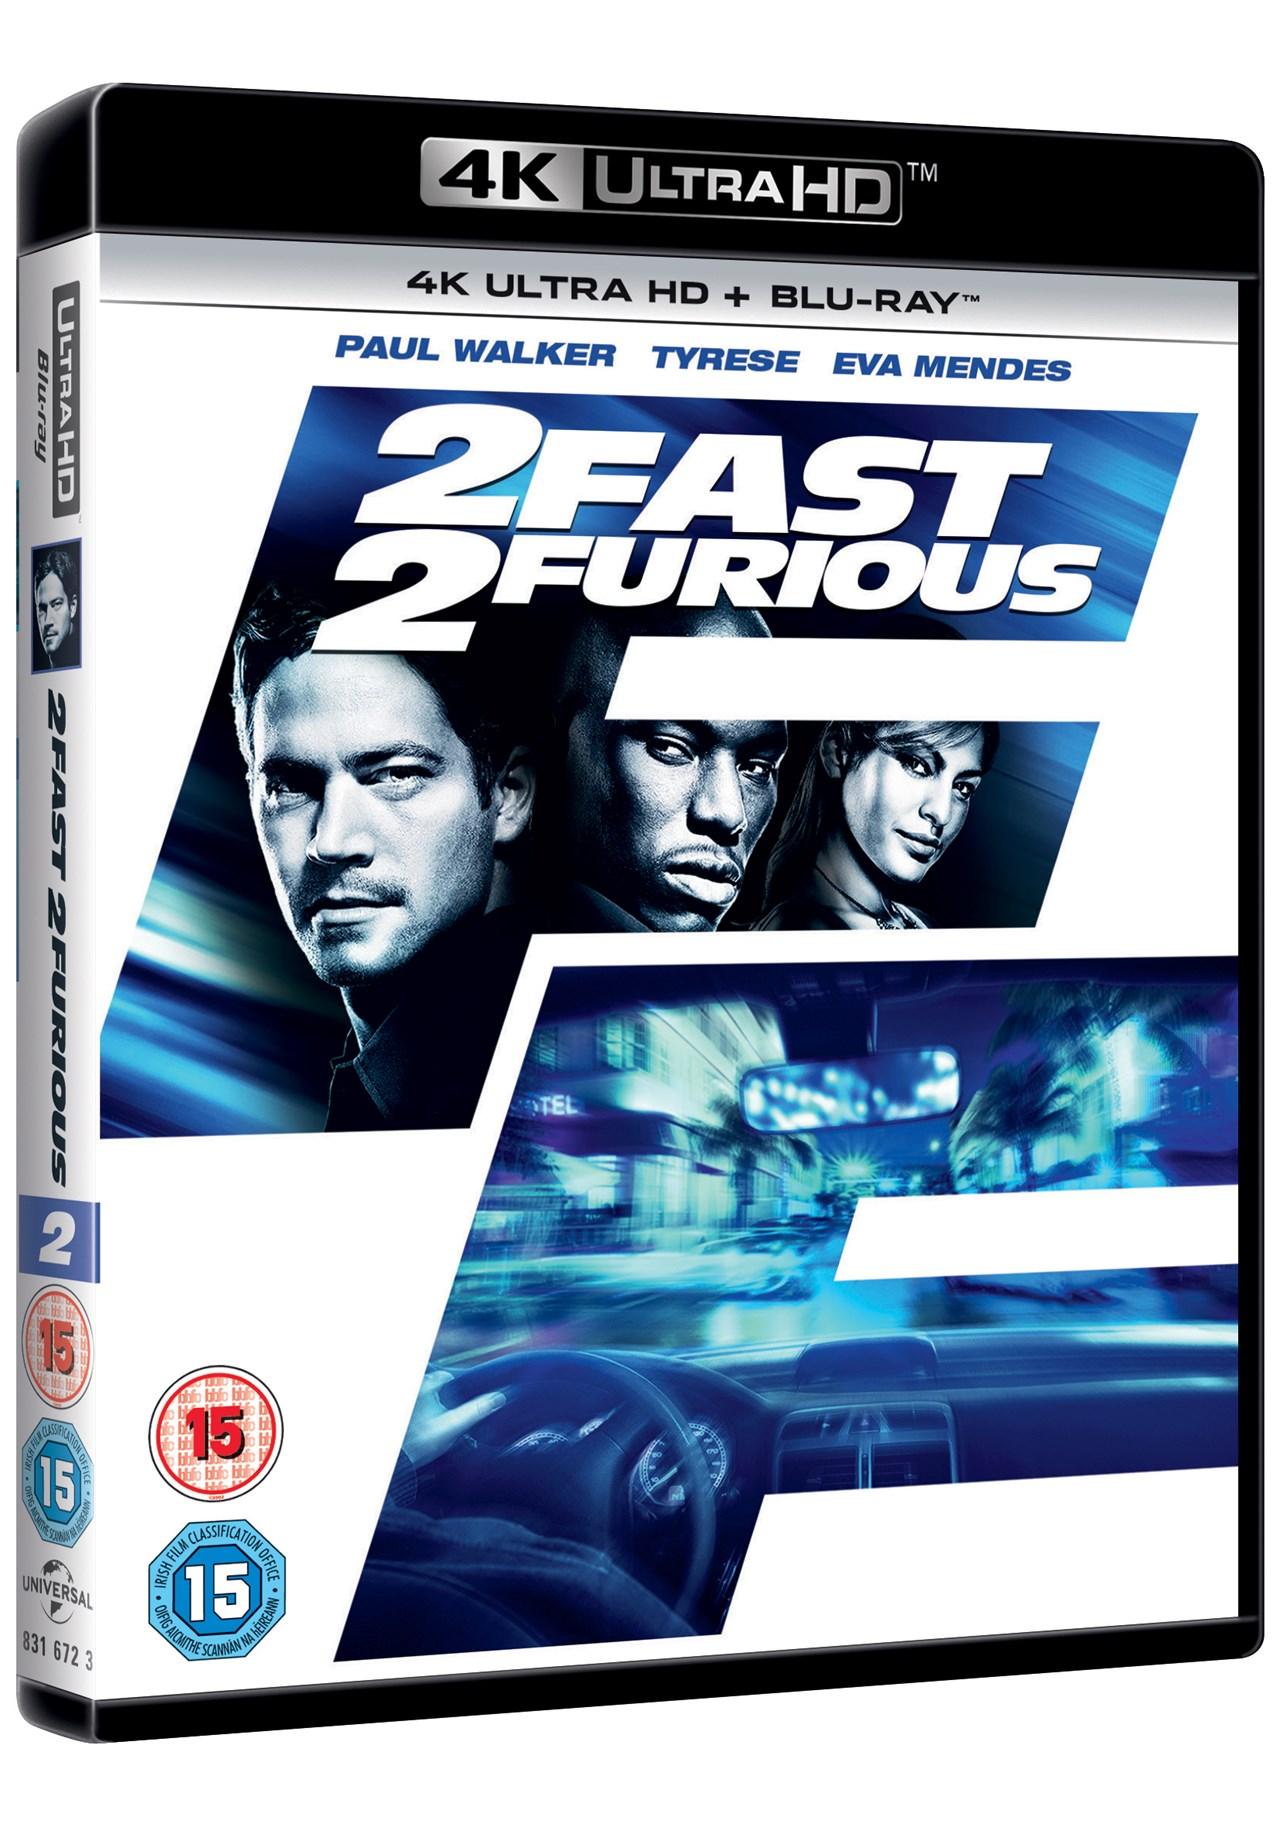 2 Fast 2 Furious - 2